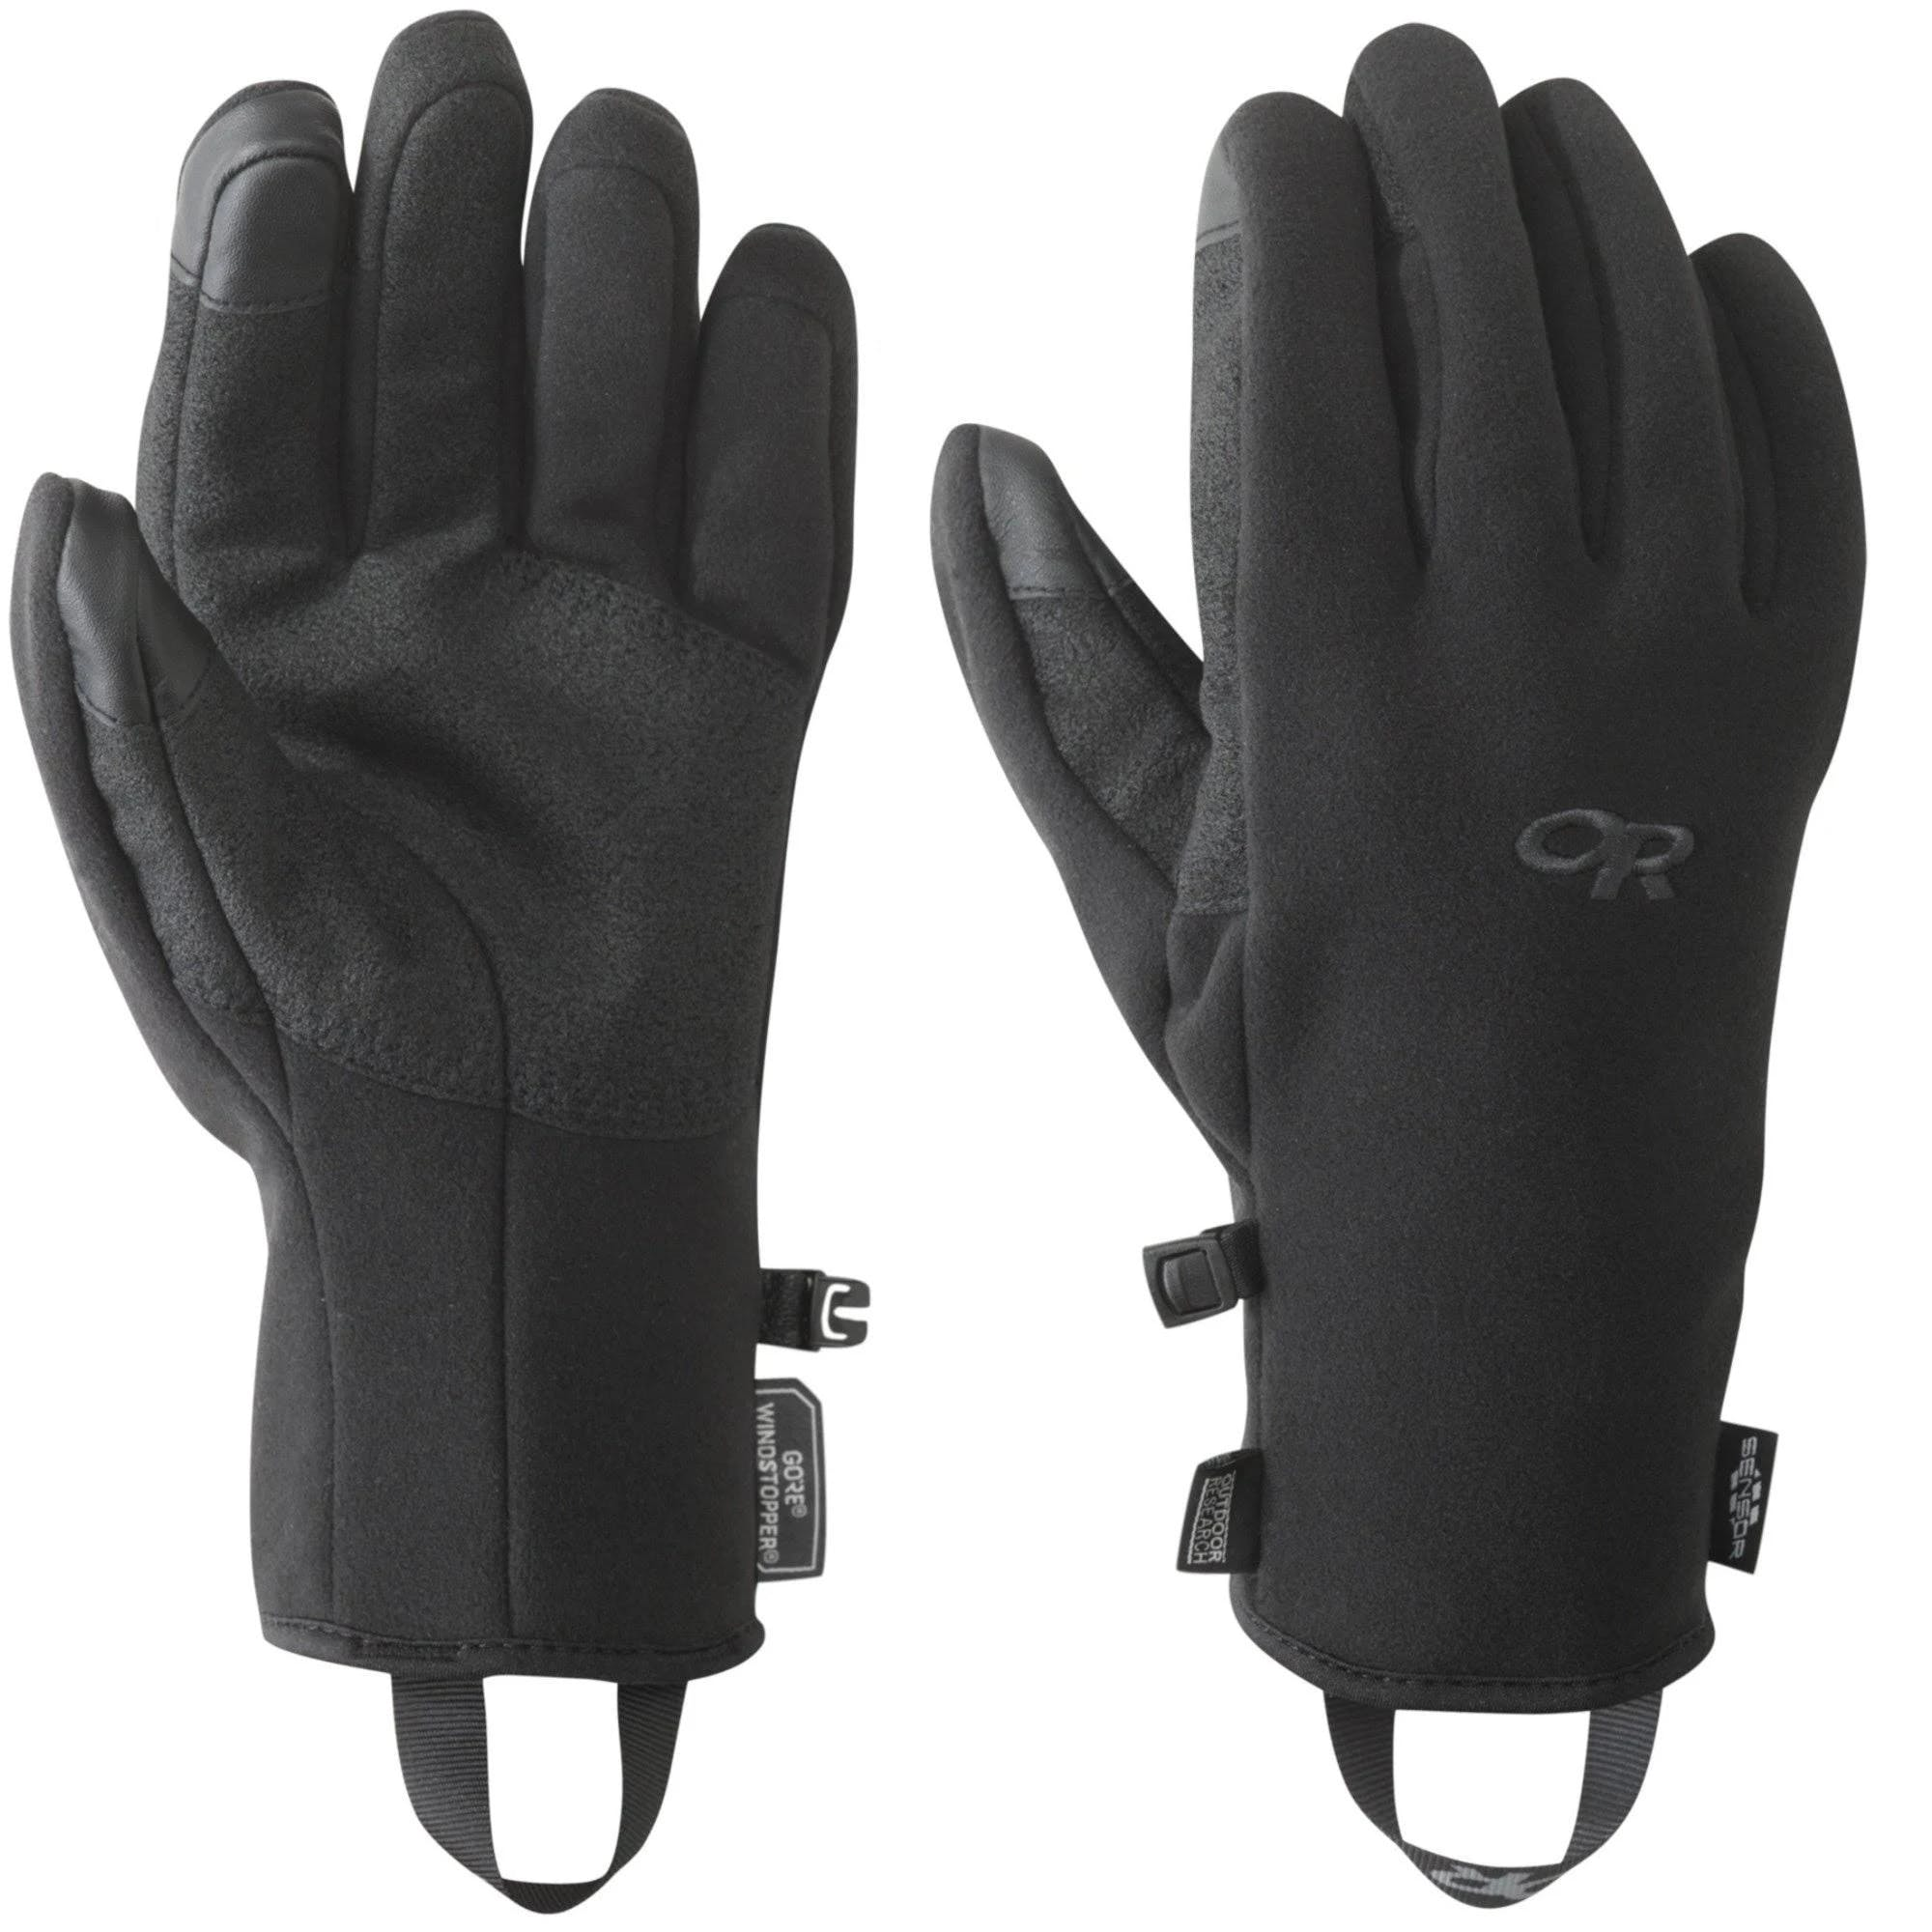 Outdoor Research Gripper Sensor Gloves Men's Black